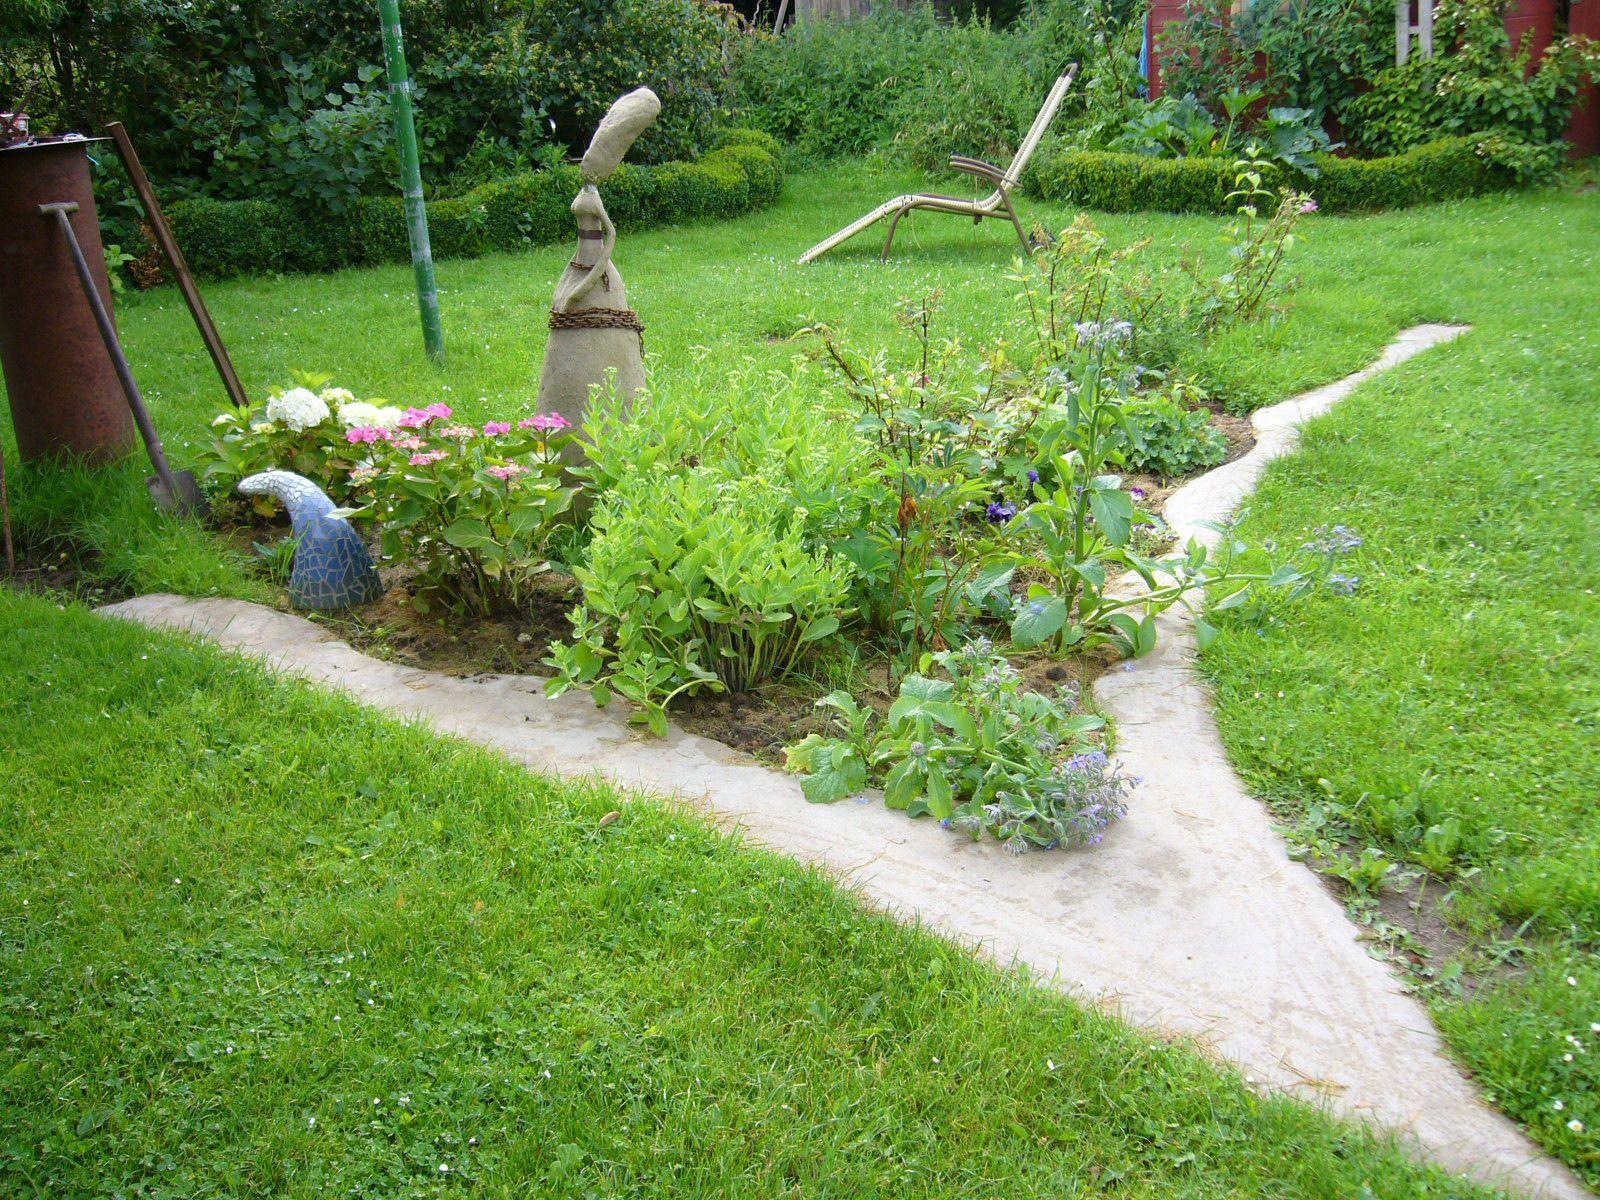 Beetbegrenzung Aus Beton Selber Machen Selfmade Garden Border